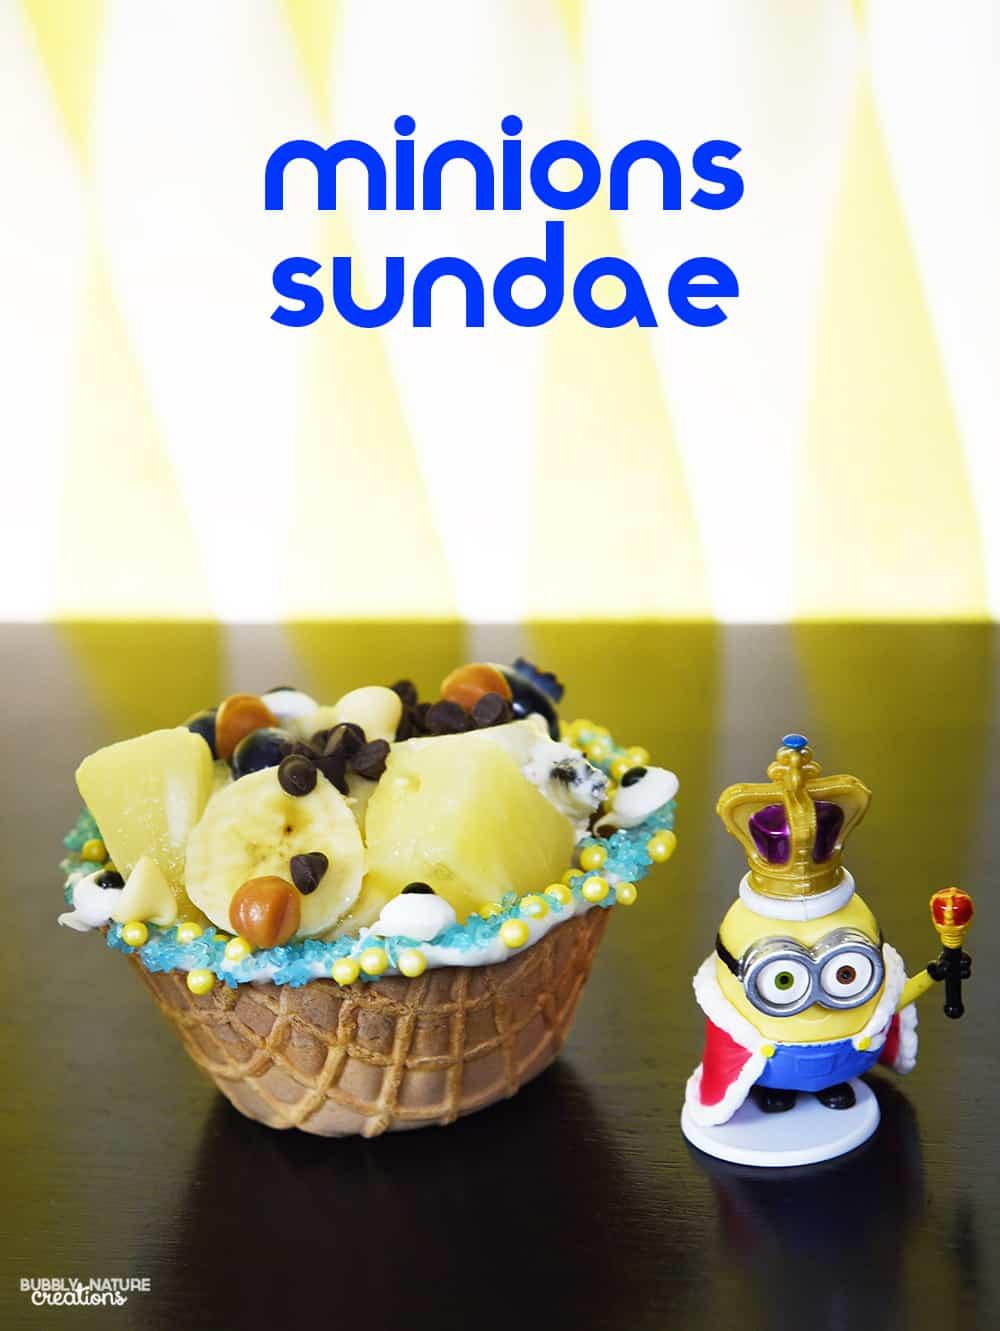 Minions Sundae!